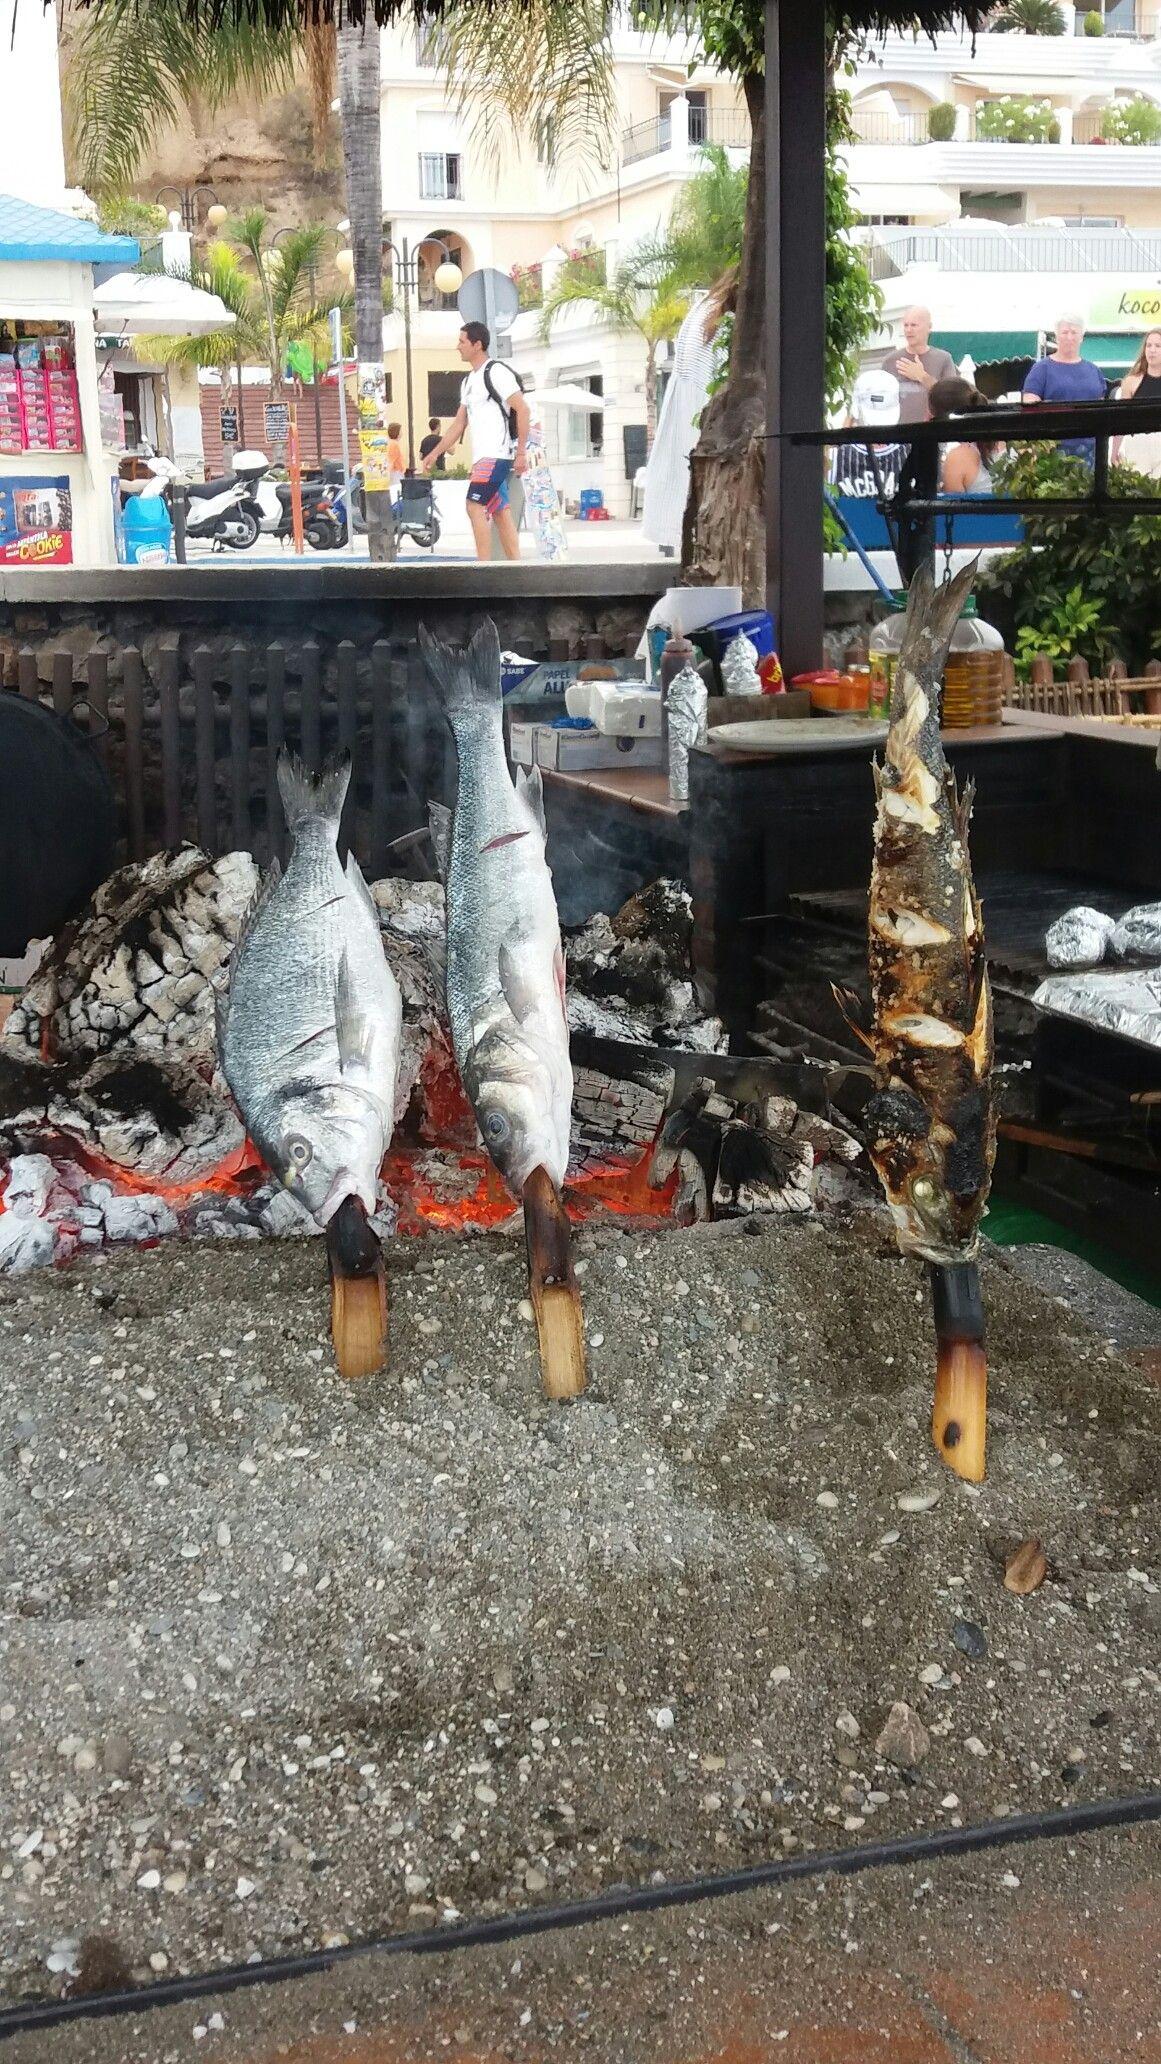 Barbeque restaurant on Burriana Beach